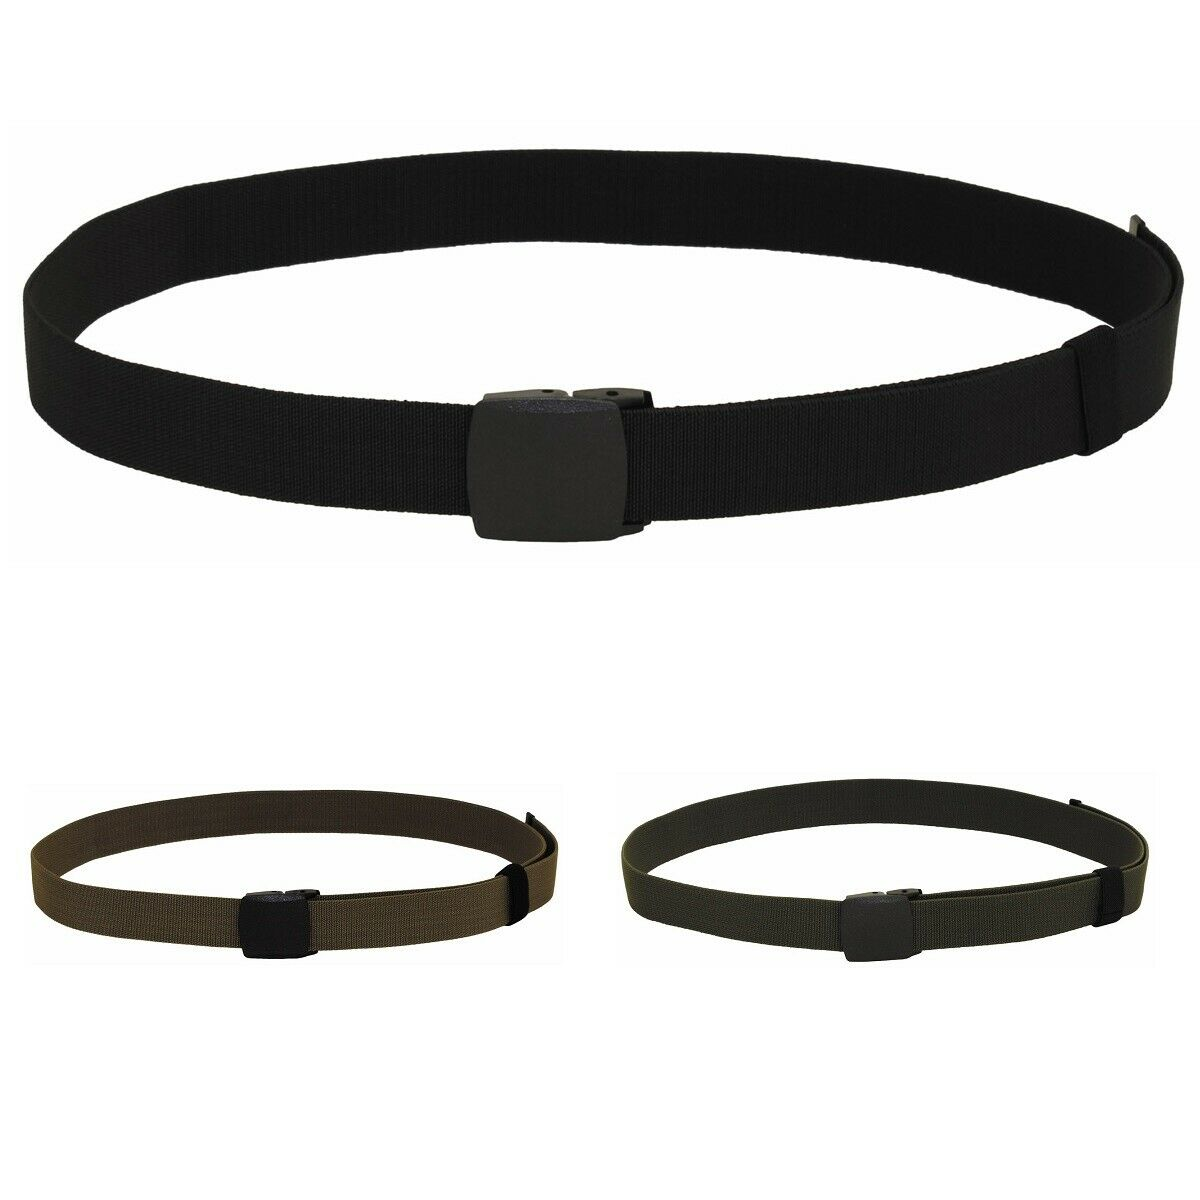 3,7 cm Stretchgürtel Tactical Gürtel elastisch Damen Herren elastic unisex